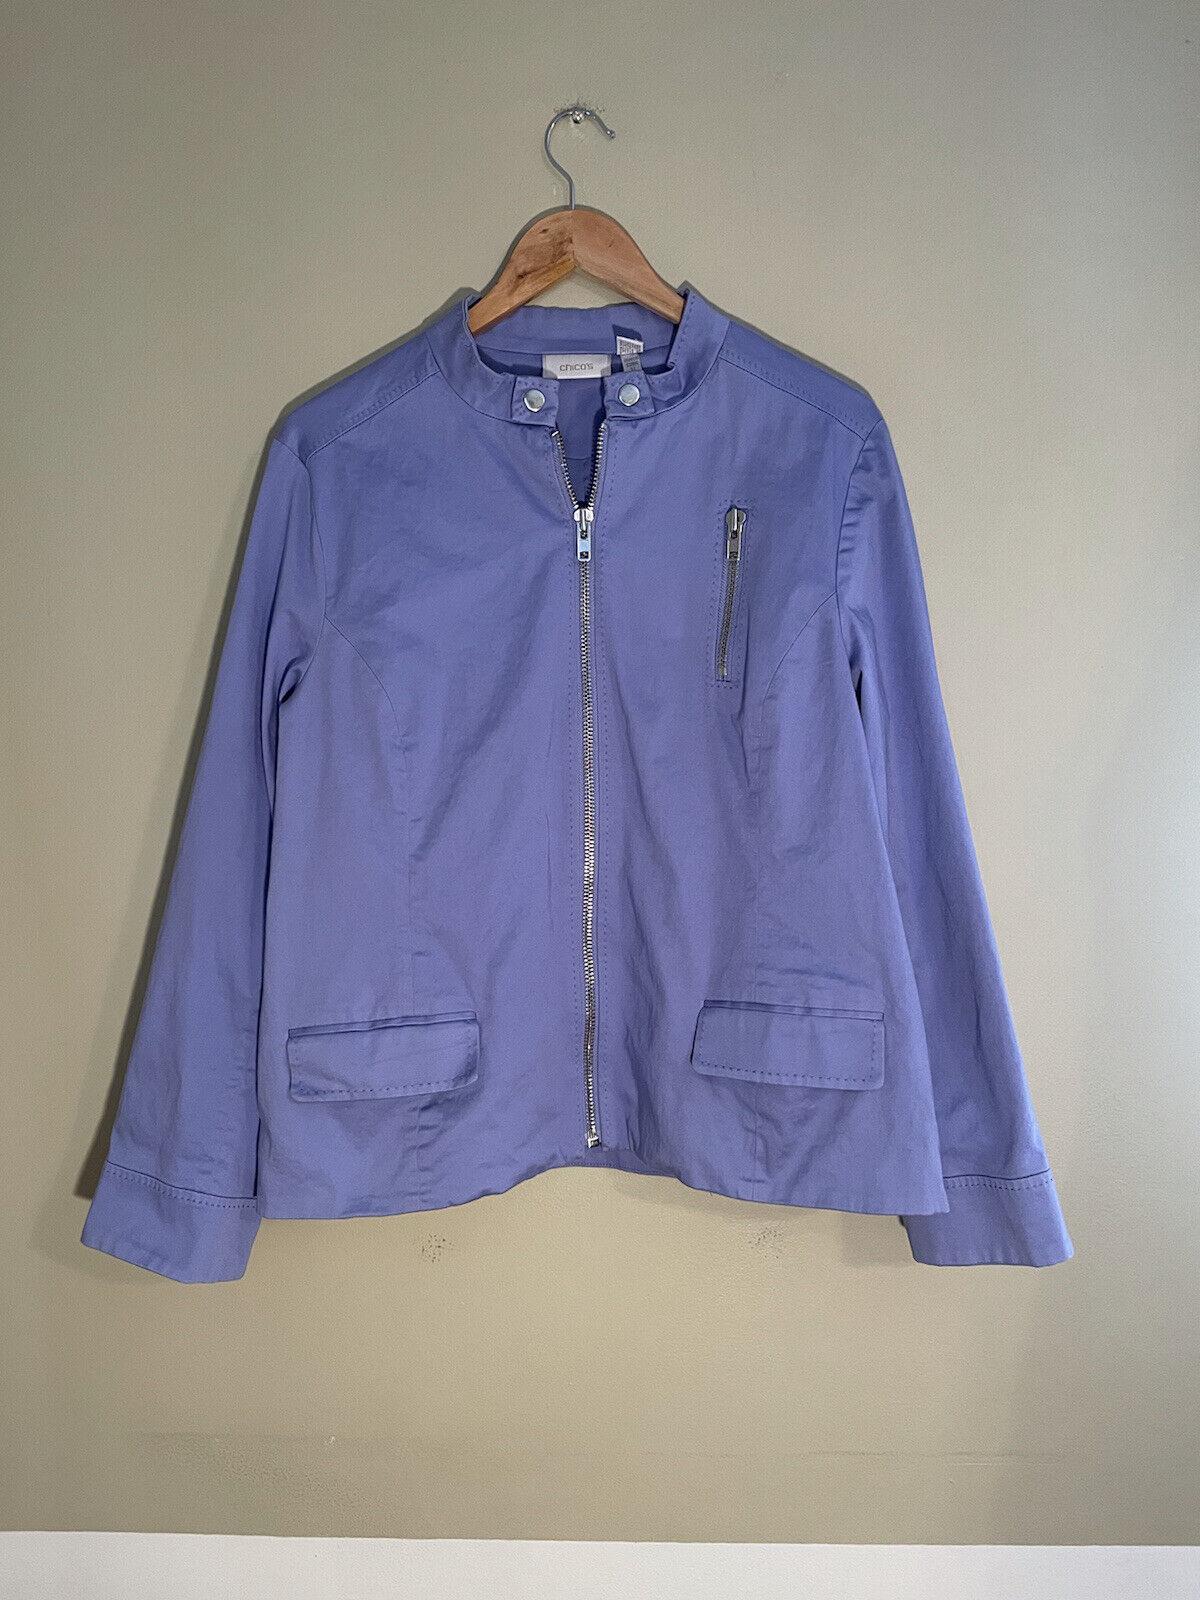 Chicos Light Purple Blazer, 95% Cotton, Size XL (3)